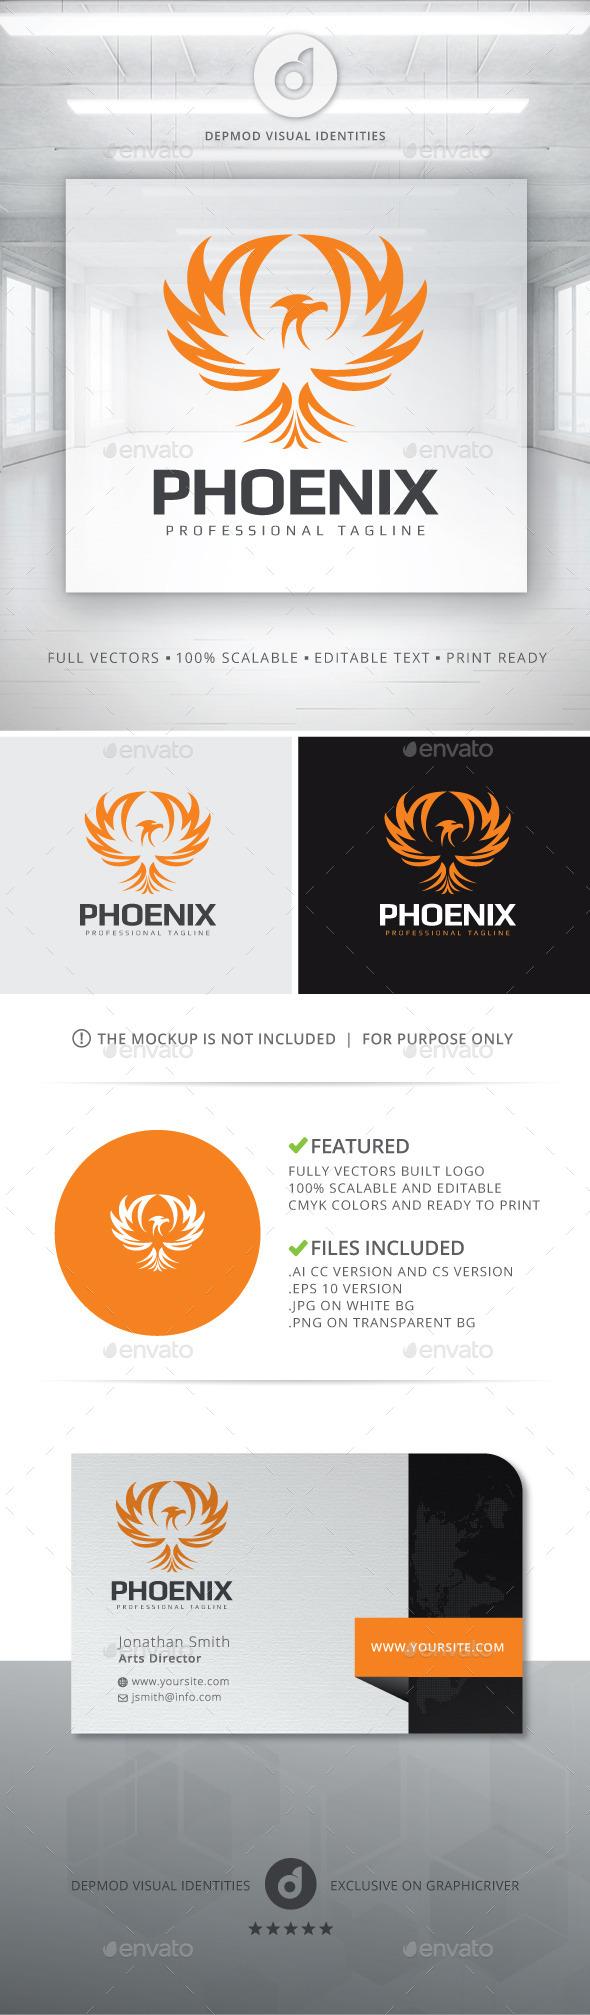 Phoenix V.02 Logo - Animals Logo Templates